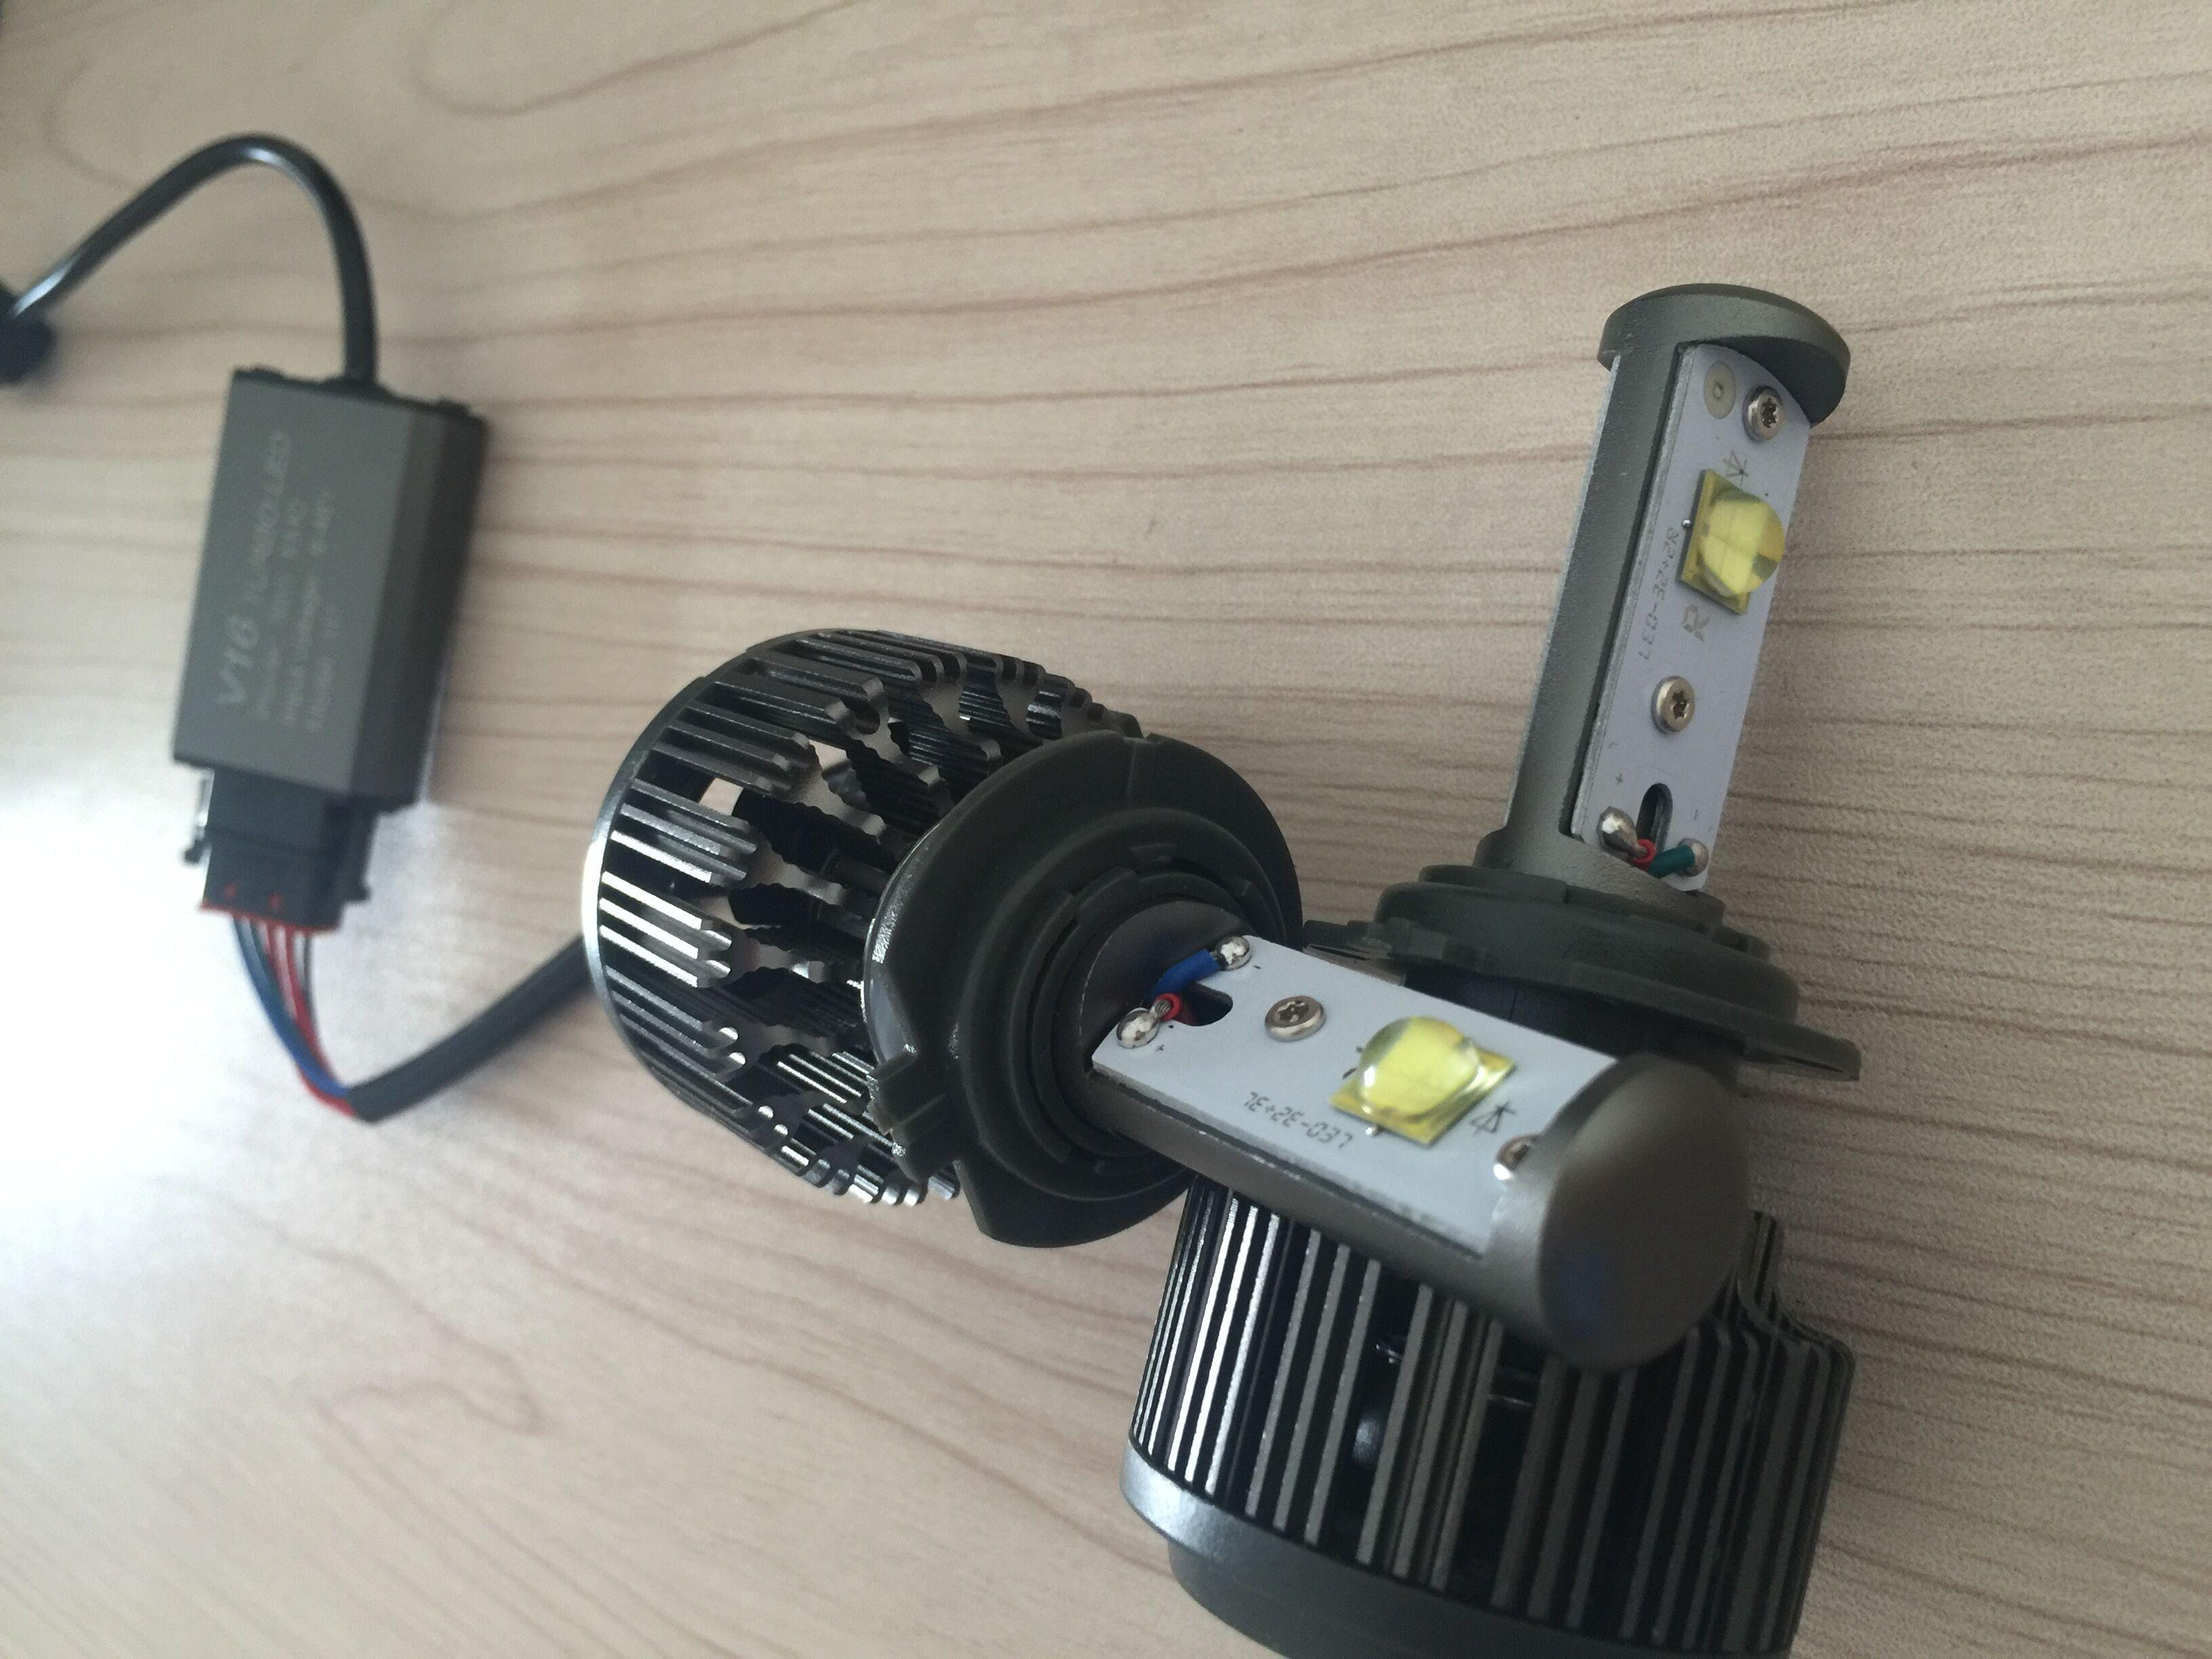 2018 v16 turbo cree led replacement headlight foglight kit 30w 3600lm 12v 24v h7 drl waterproof. Black Bedroom Furniture Sets. Home Design Ideas